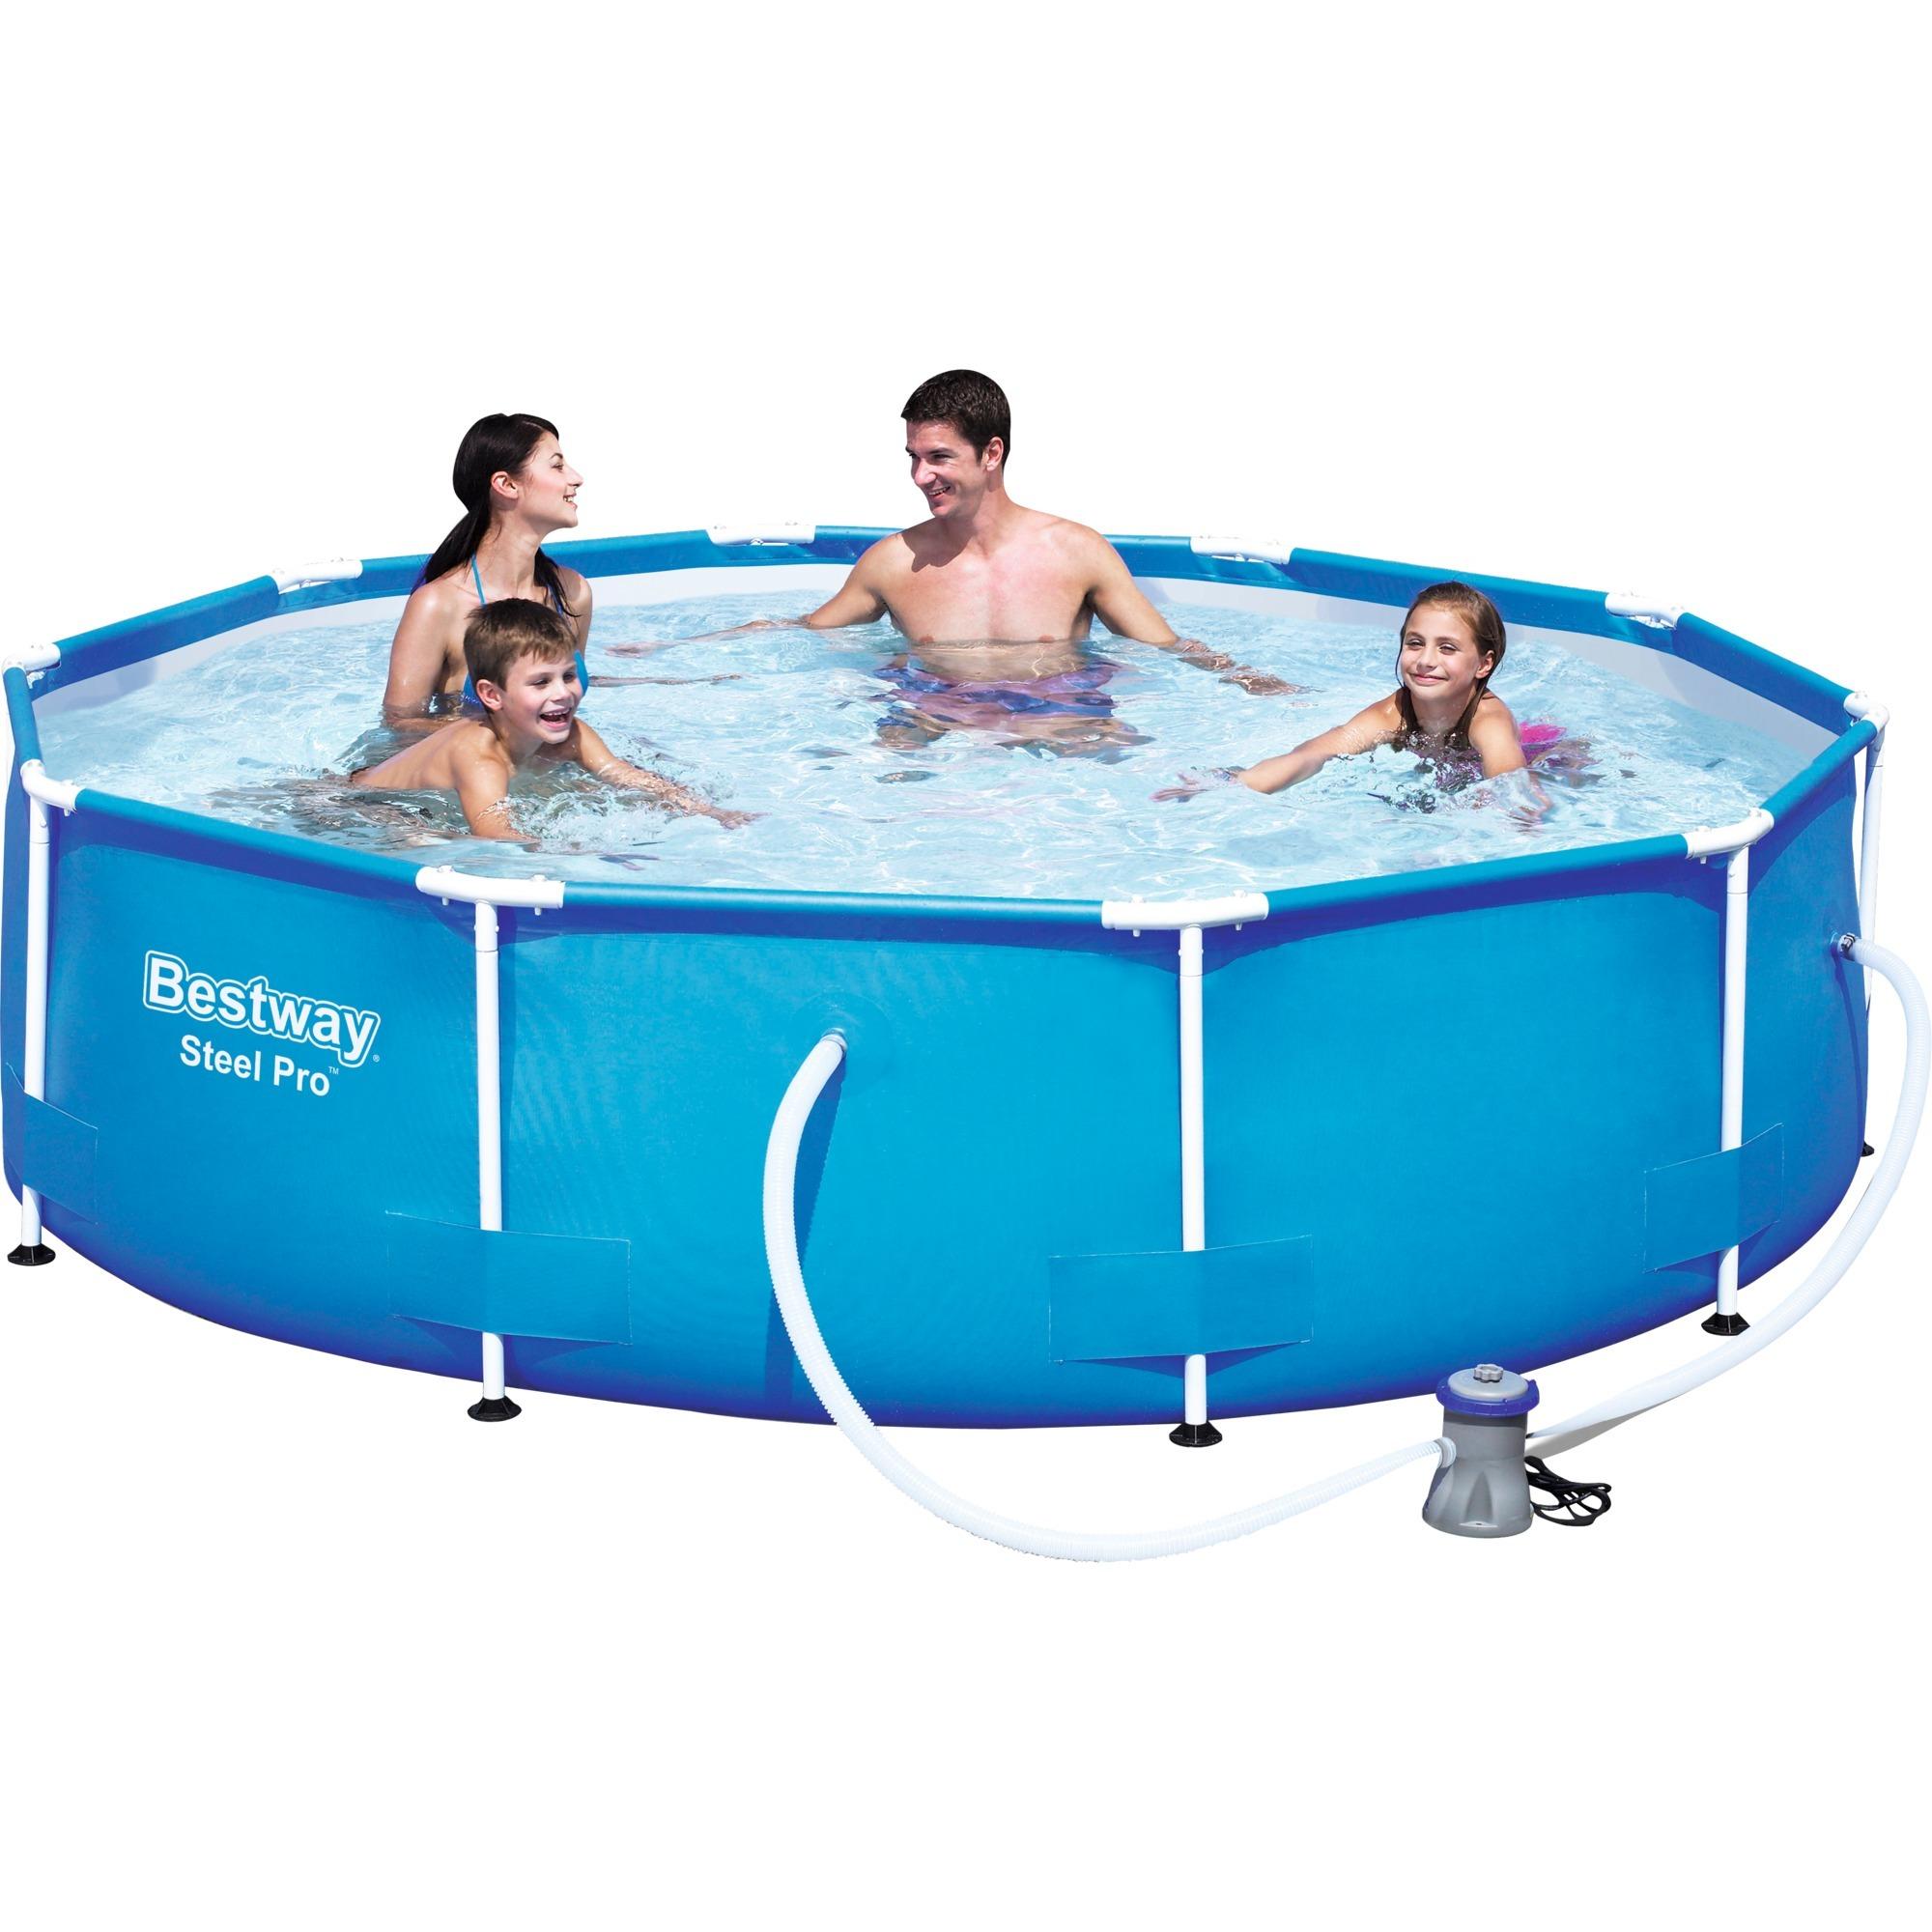 Bestway piscina steel pro frame 2 39 x trova prezzi - Manutenzione piscina fuori terra bestway ...